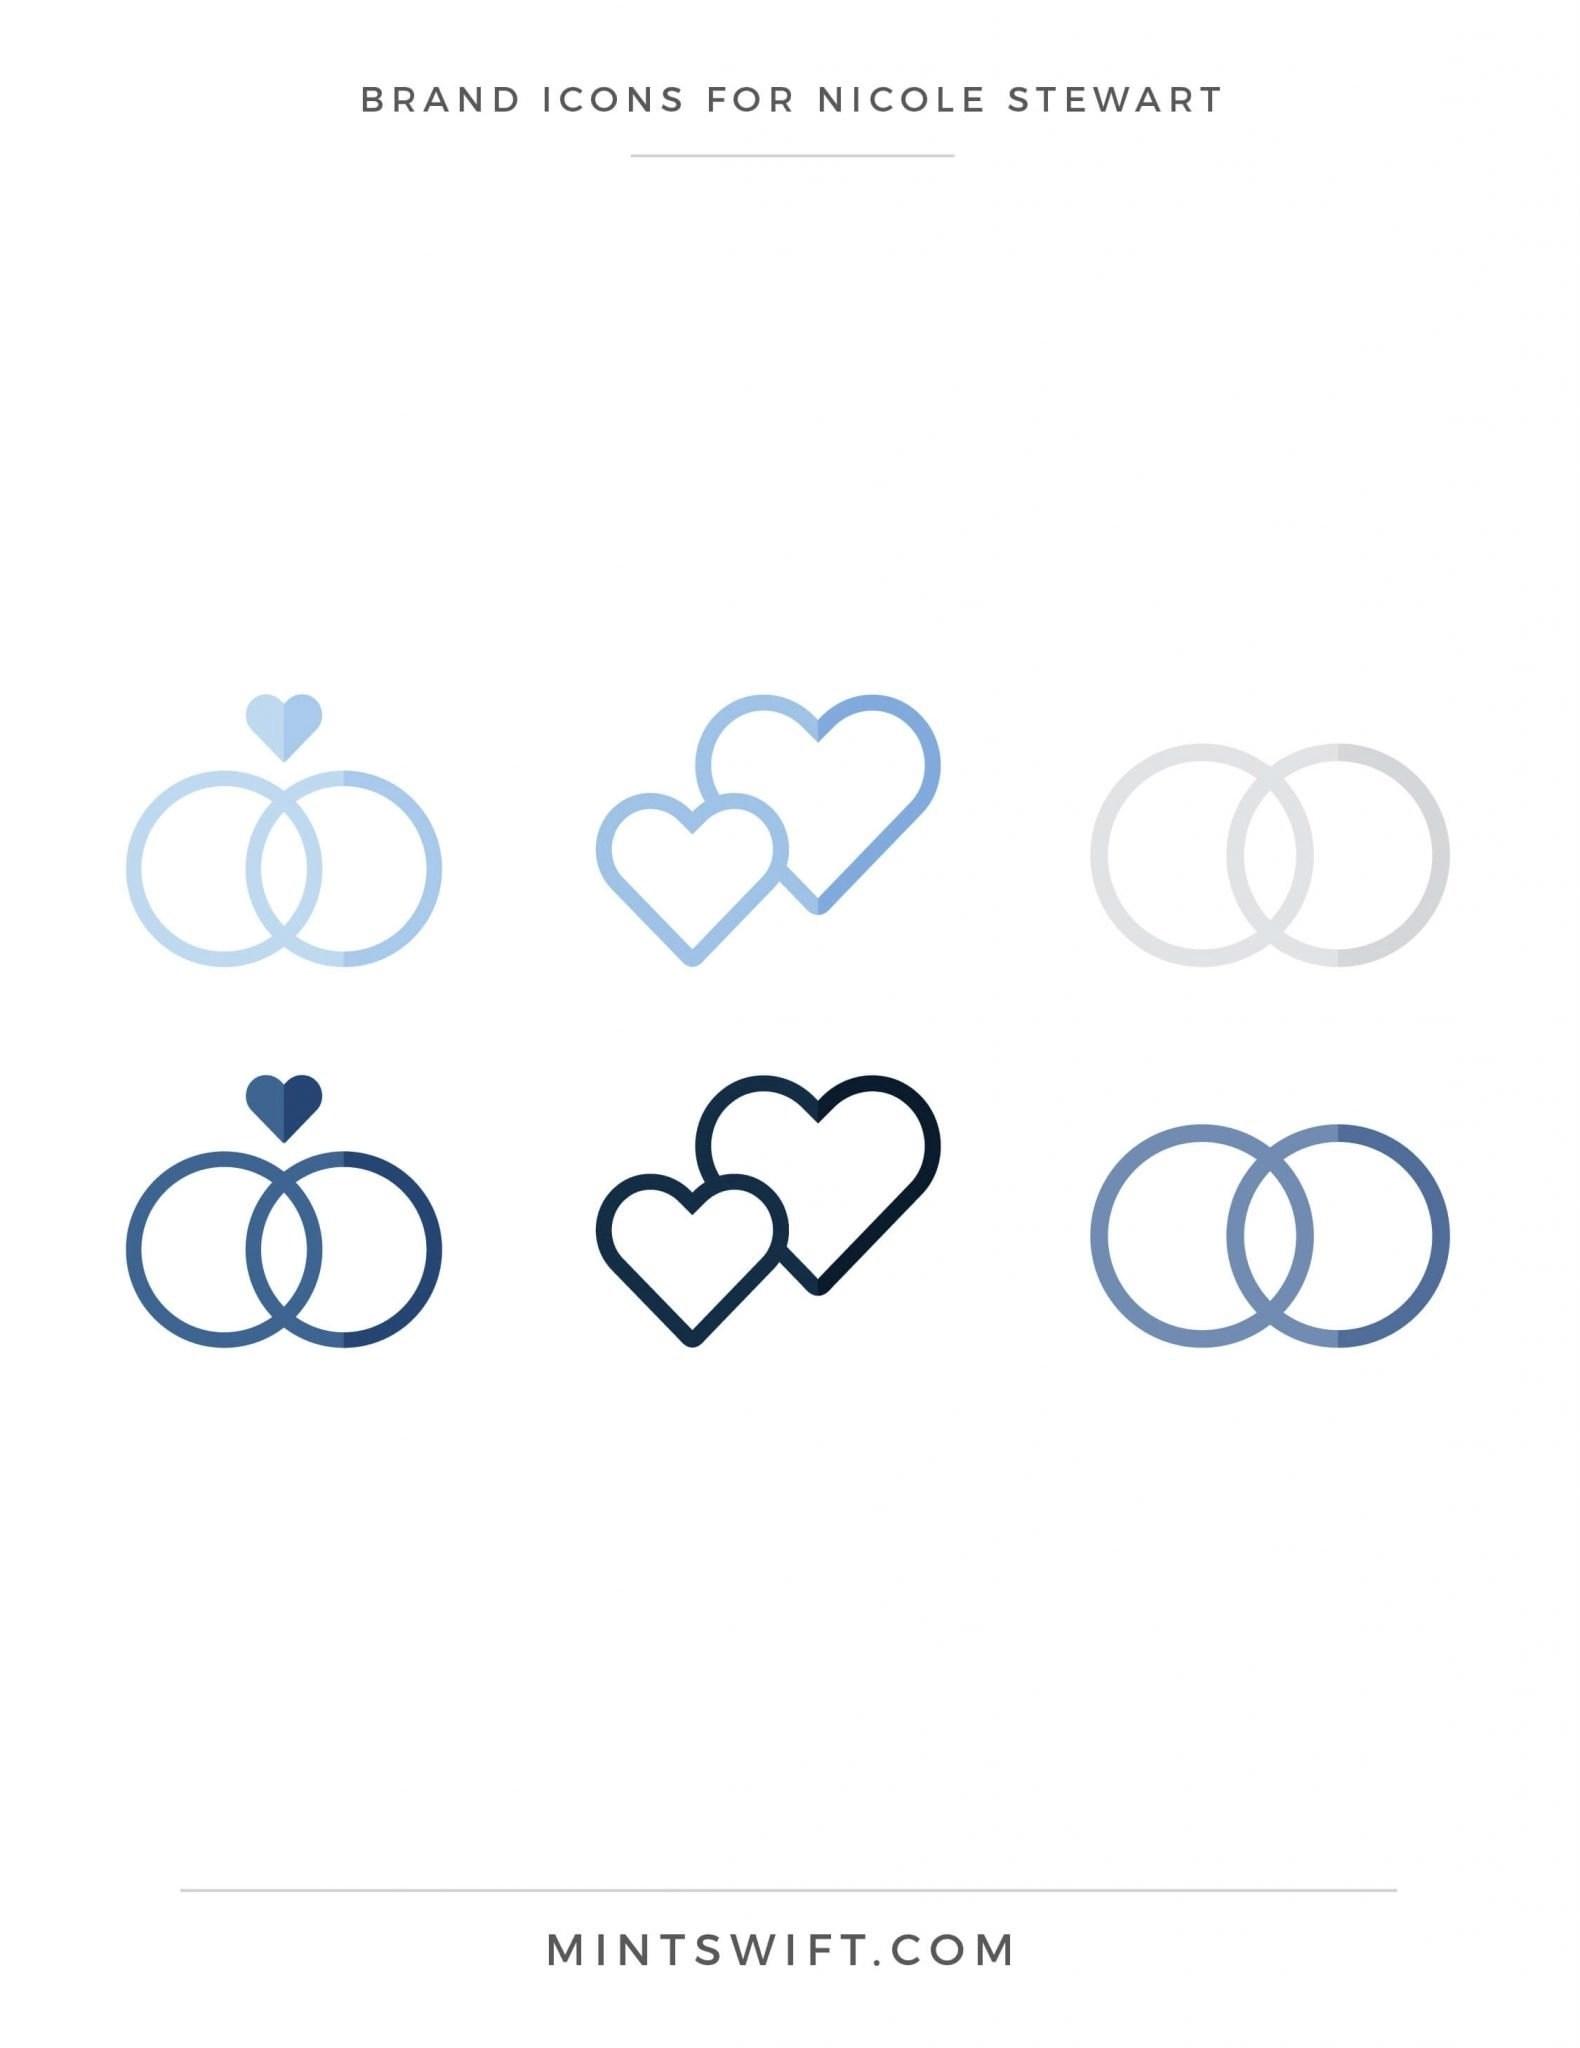 Nicole Stewart - Brand Icons - Brand Design Package - MintSwift